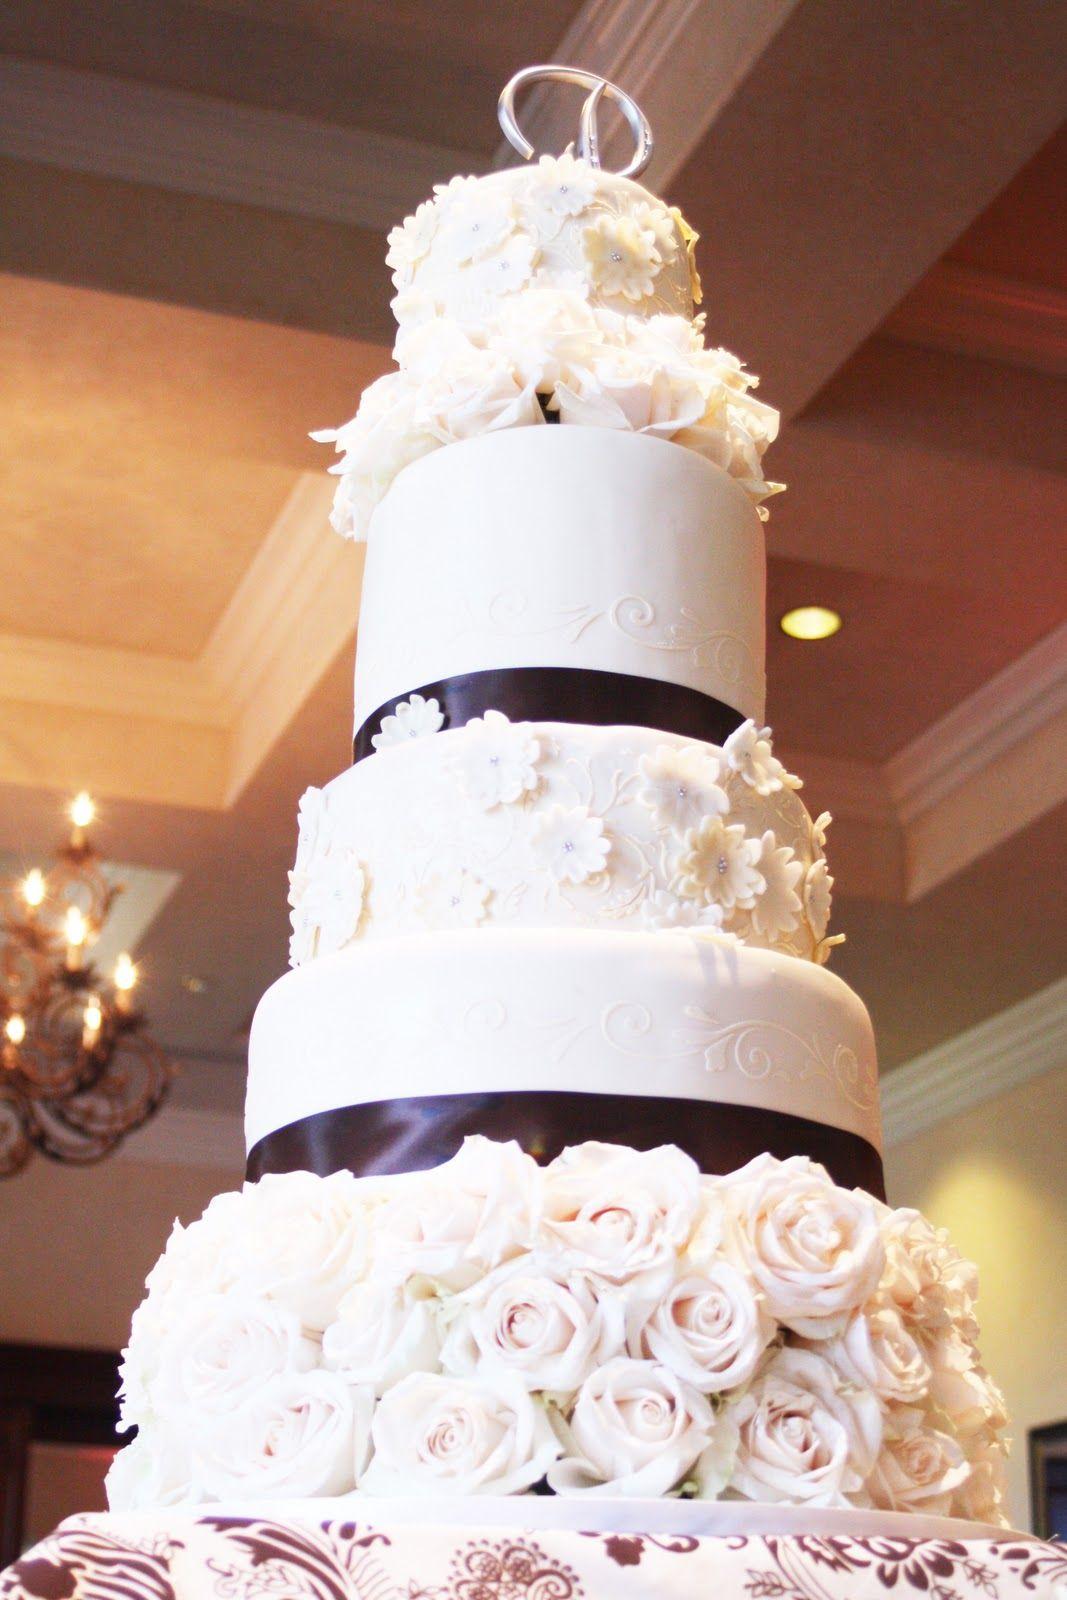 Wedding decor all white  Wedding Cakeeditedg   Let them eat  CAKE